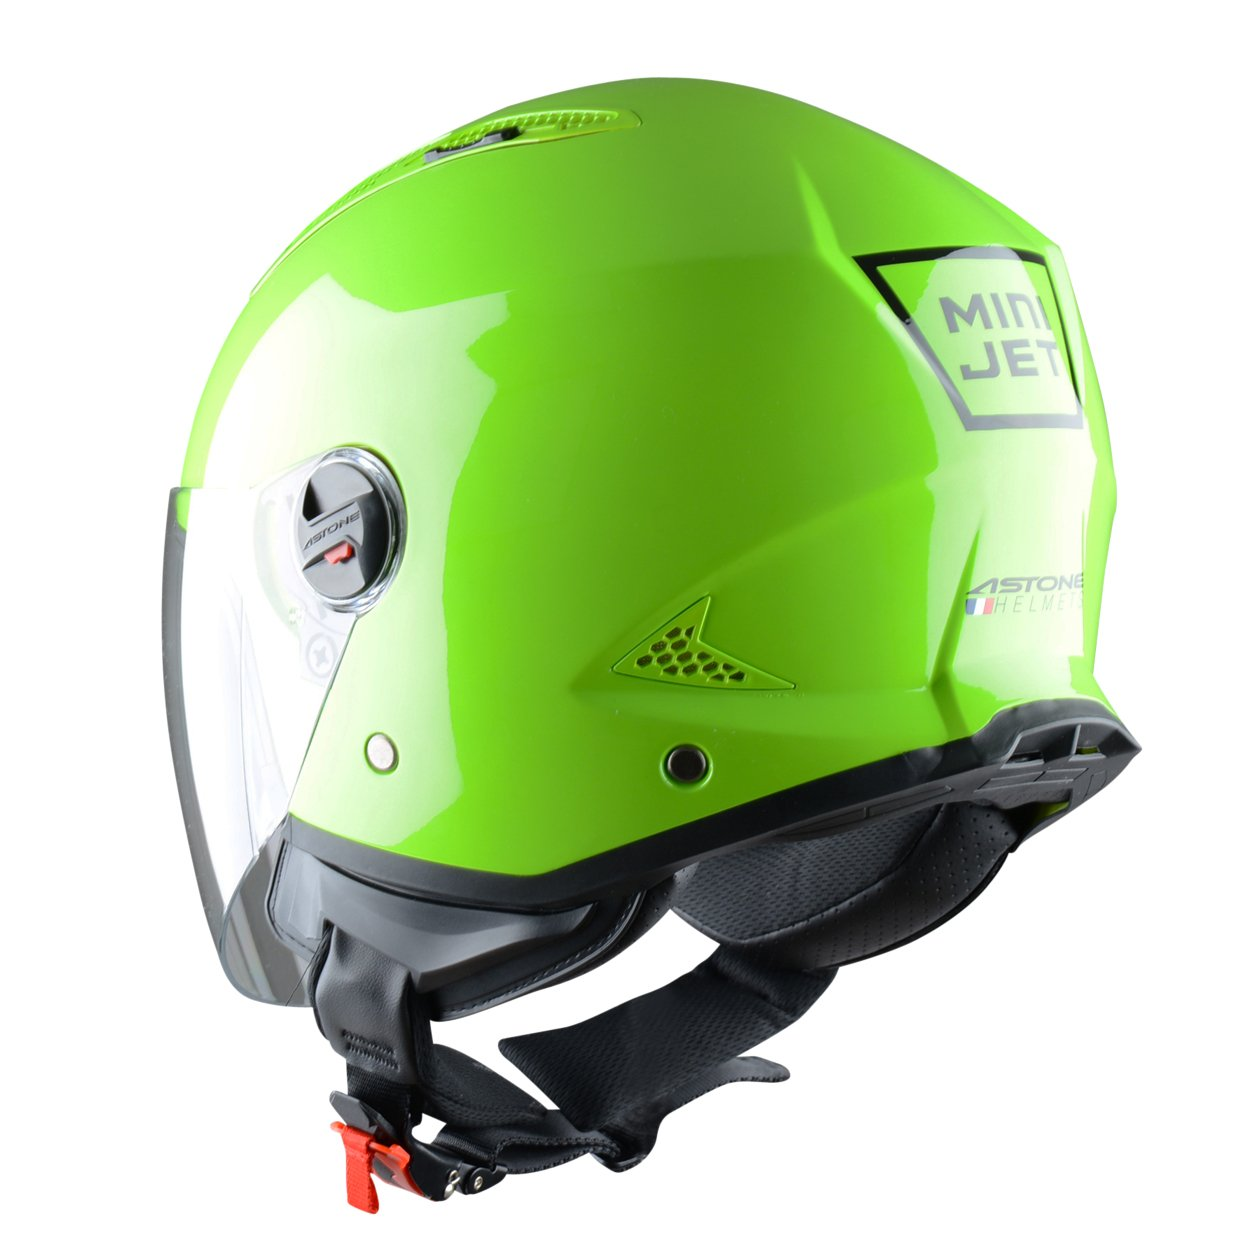 Astone Helmets Mini casco Jet